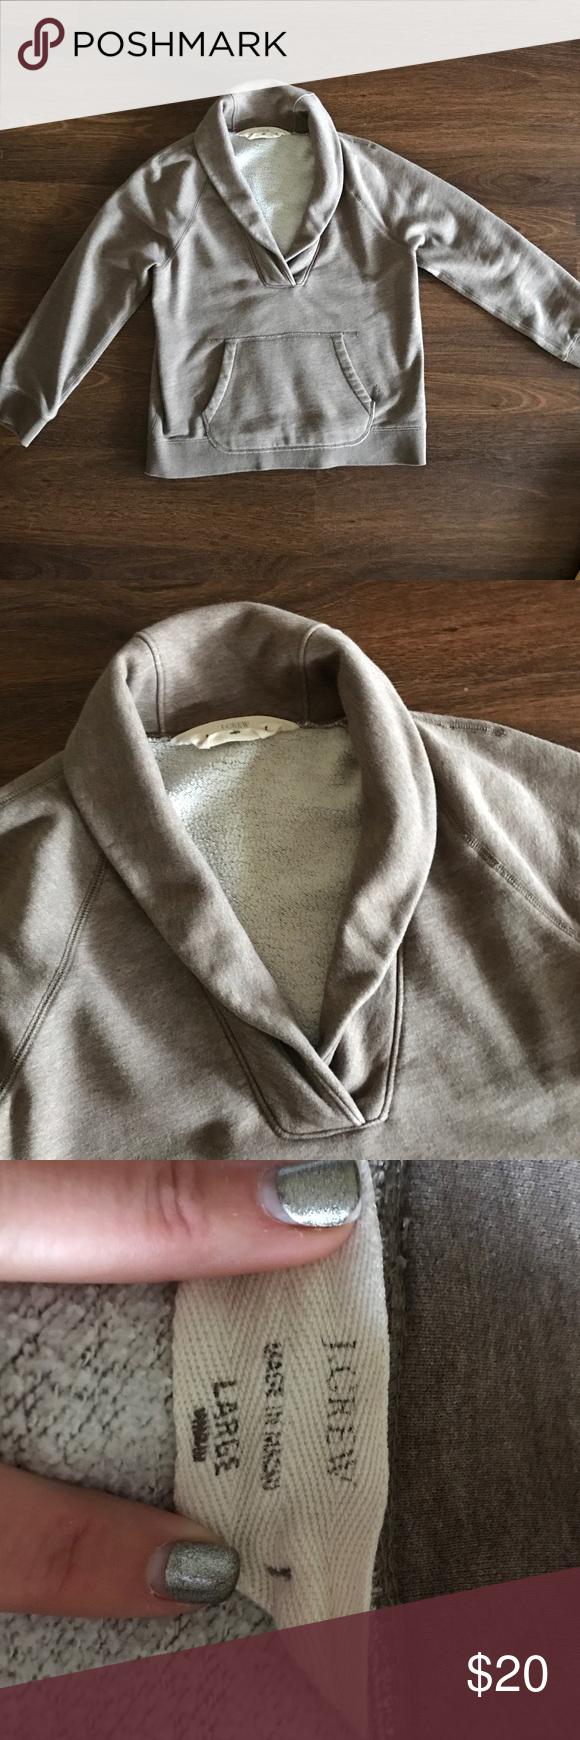 Jcrew light brown sweatshirt (L) Jcrew light brown sweatshirt, size large J. Crew Sweaters Crew & Scoop Necks